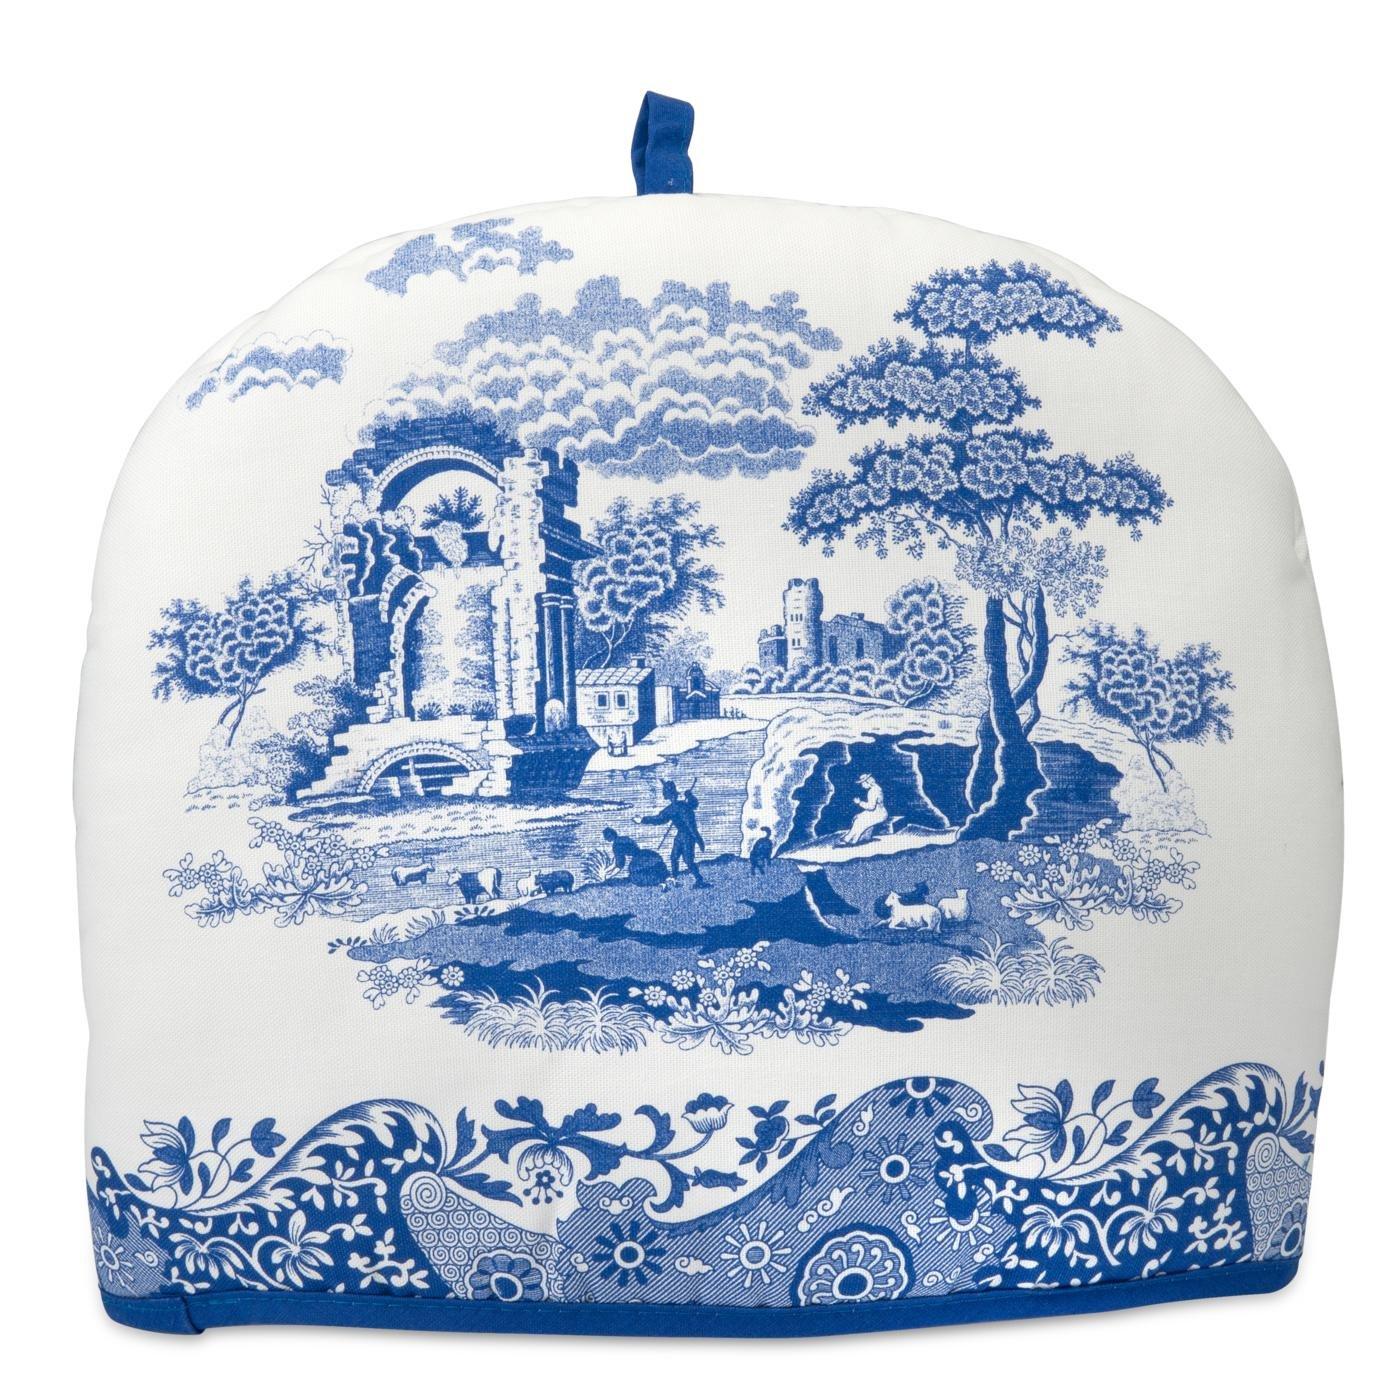 Spode Blue Italian Tea Cosy Pimpernel X0015168337